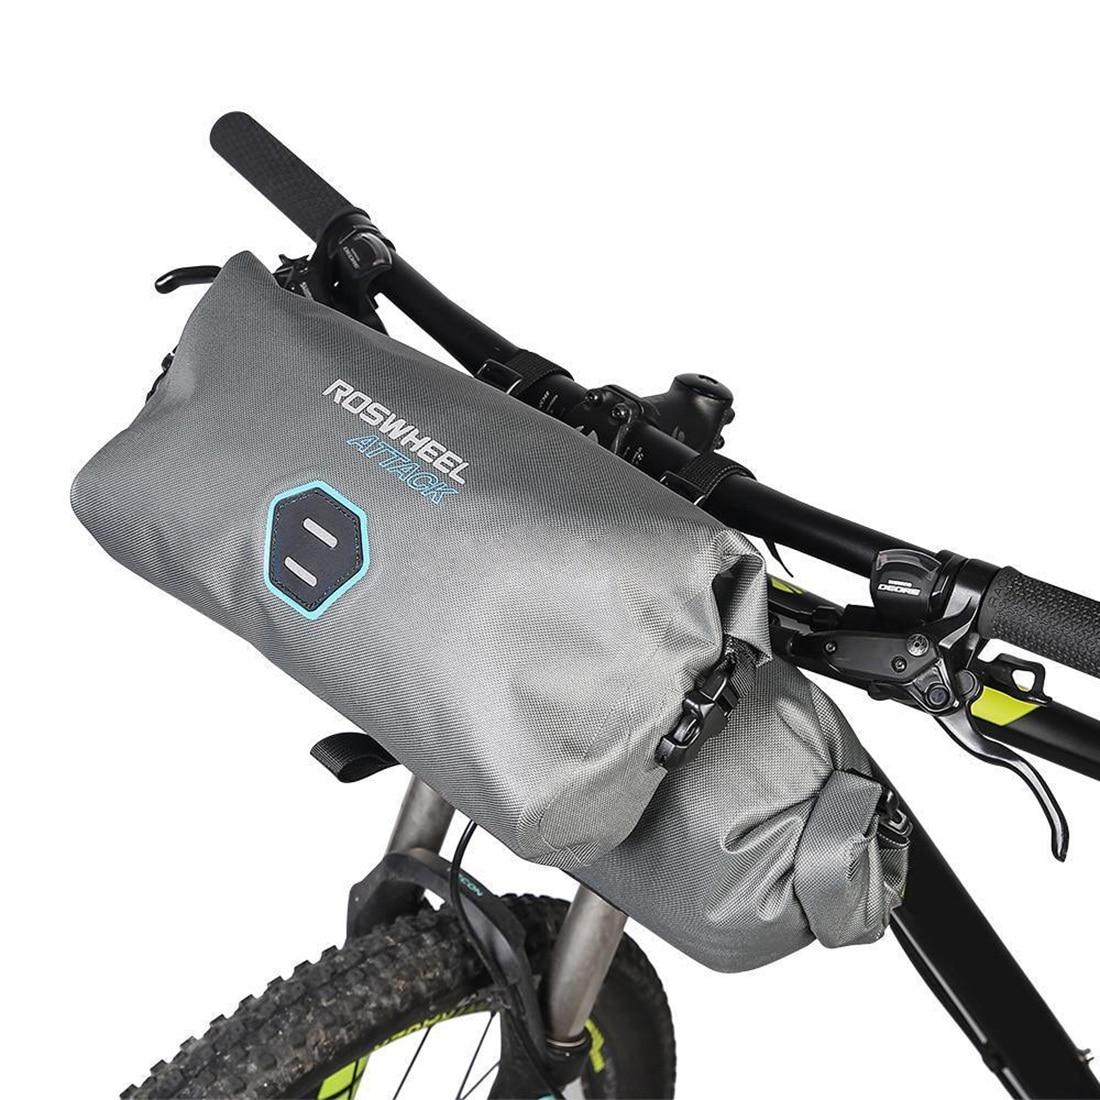 SEWS-ROSWHEEL 111458 12L TPU Waterproof Cycling Bag MTB Bike Top Front Handlebar Bag точка доступа ubiquiti uap unifi ap